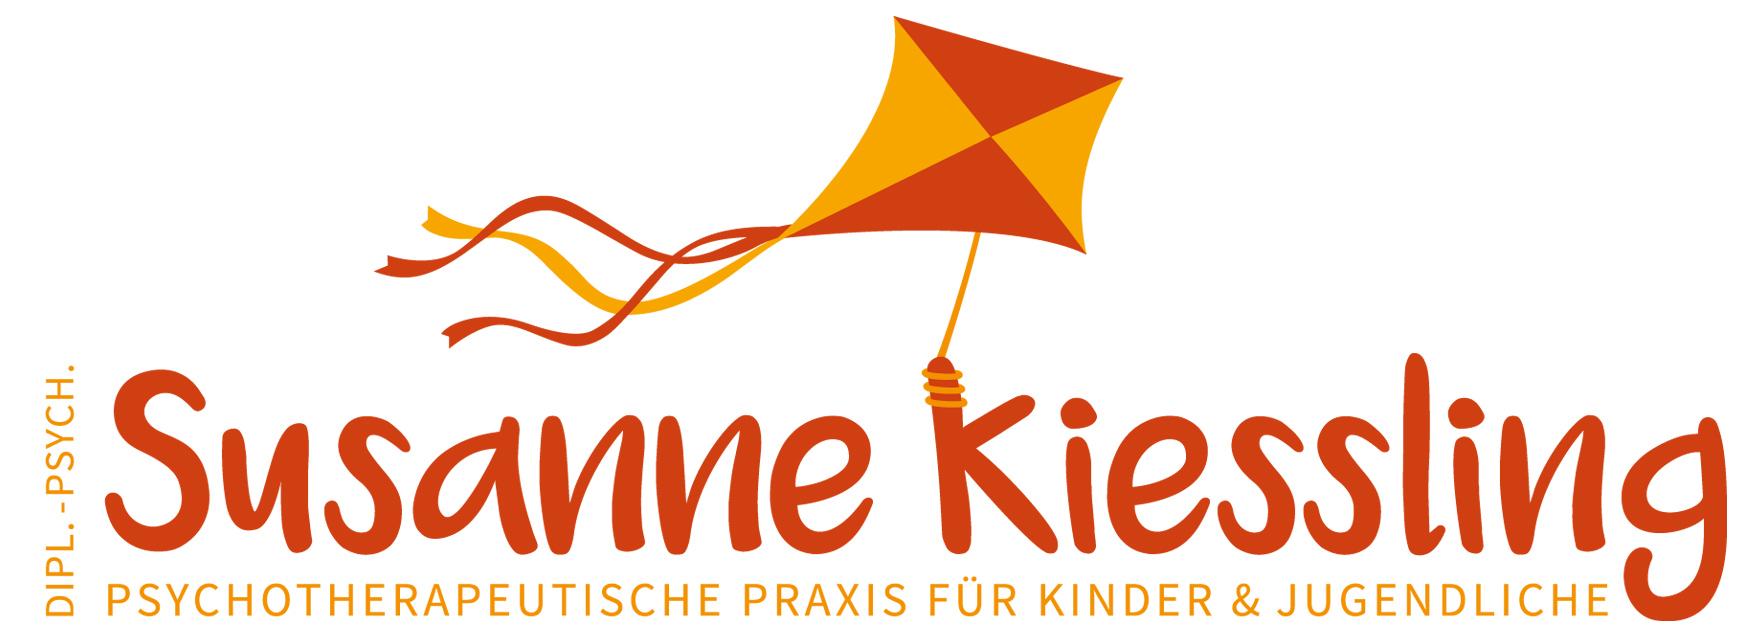 Susanne Kiessling, Dipl.-Psych. Psychotherapeutische Praxis